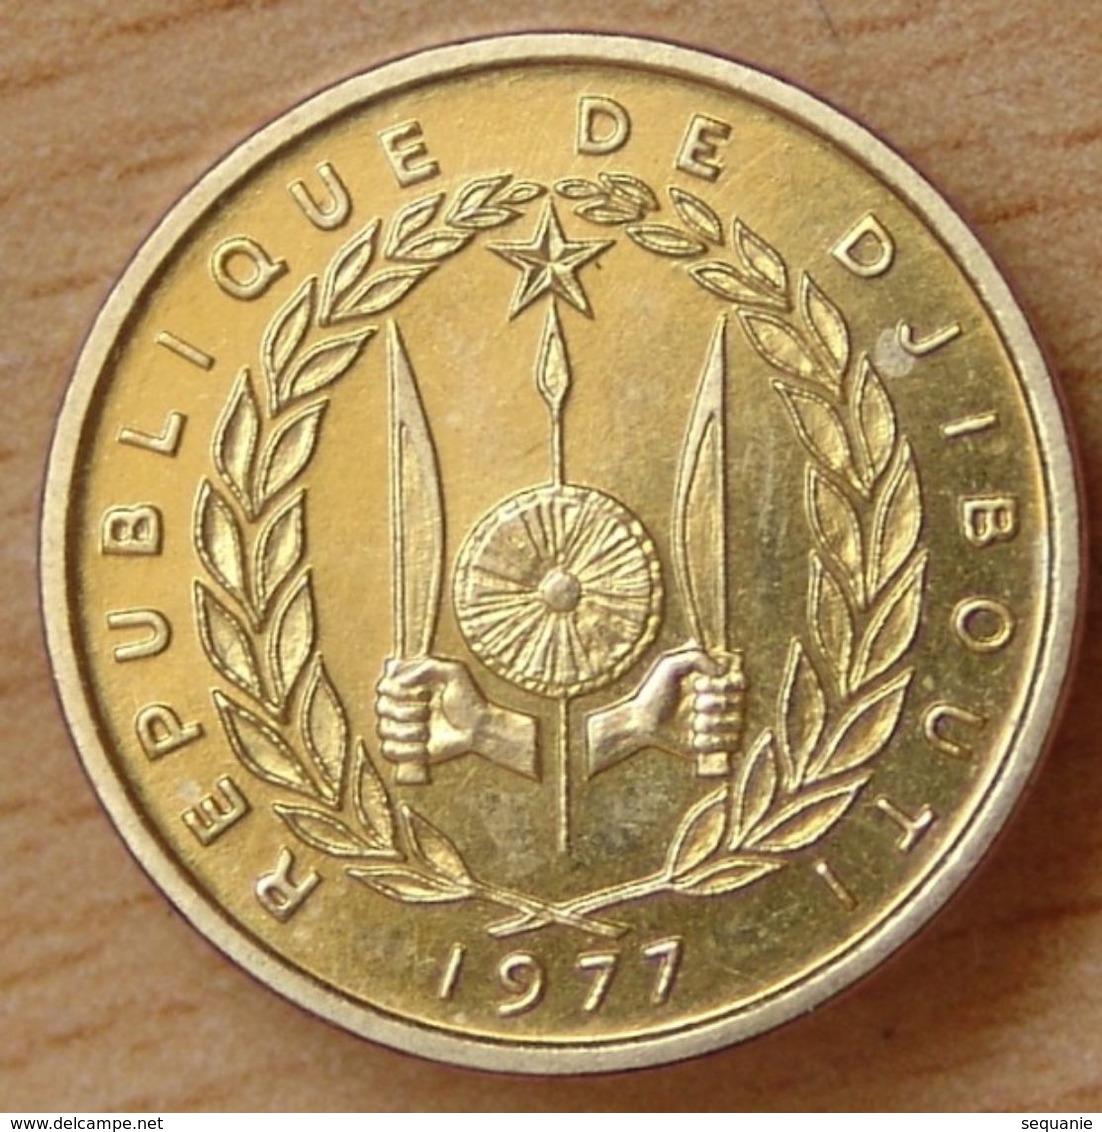 Djibouti 10 Francs 1977 ESSAI République De Djibouti - Djibouti